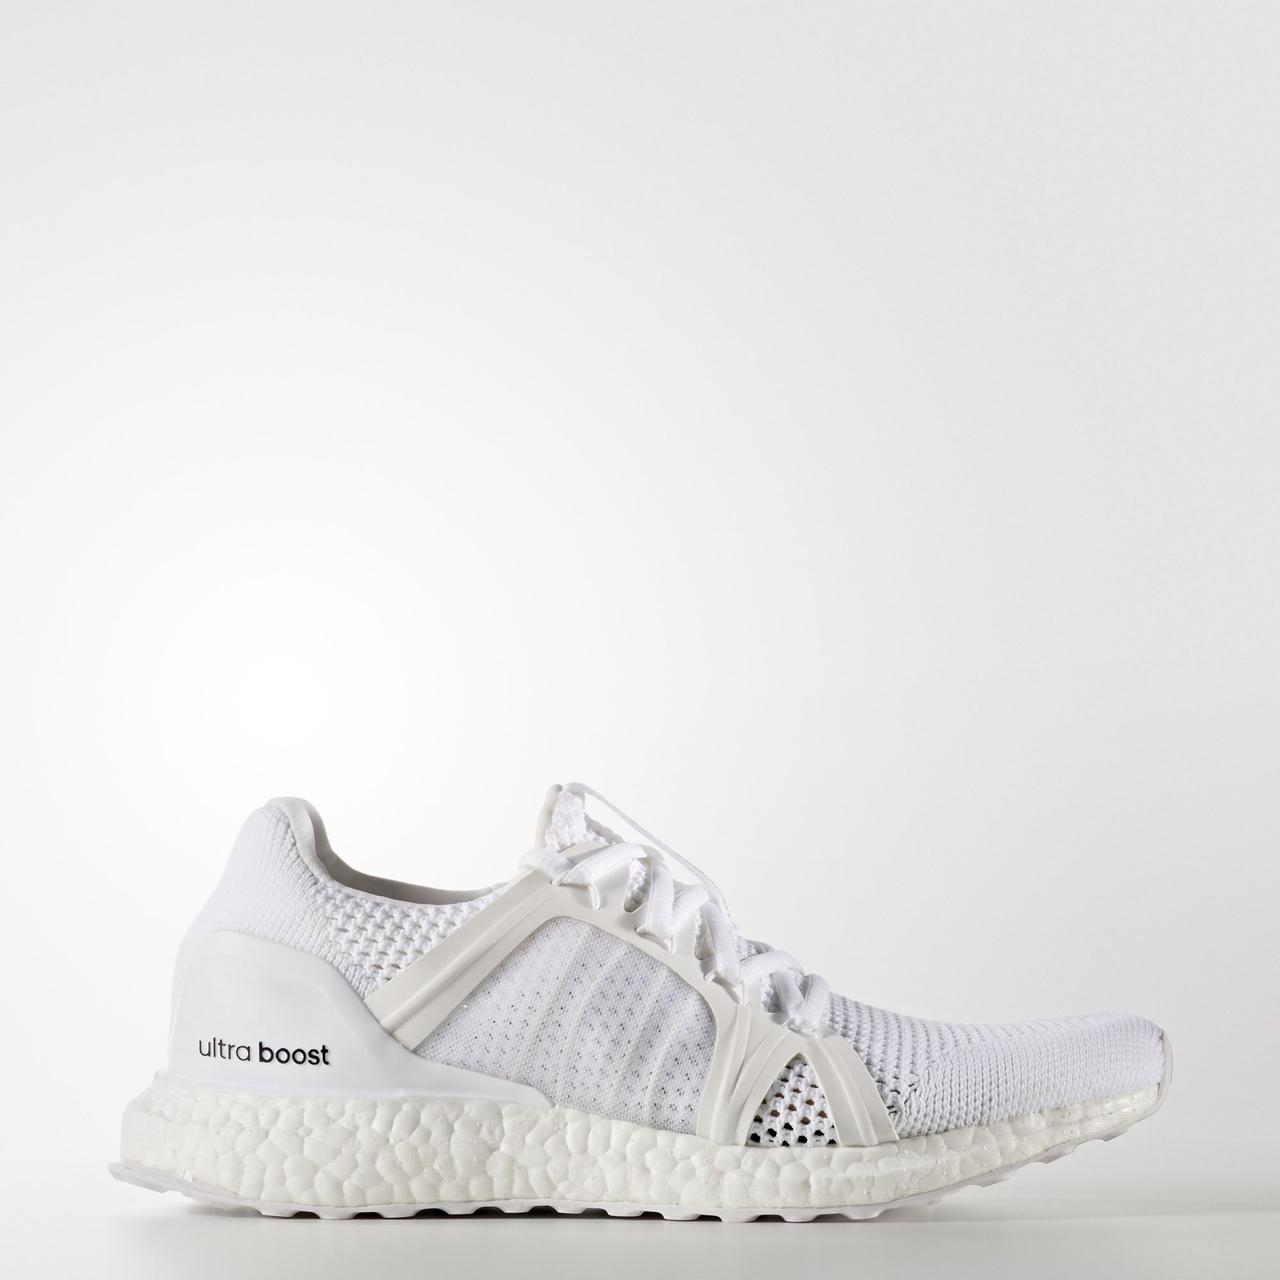 Кроссовки для бега Adidas Stella McCartney Ultra Boost BB0820